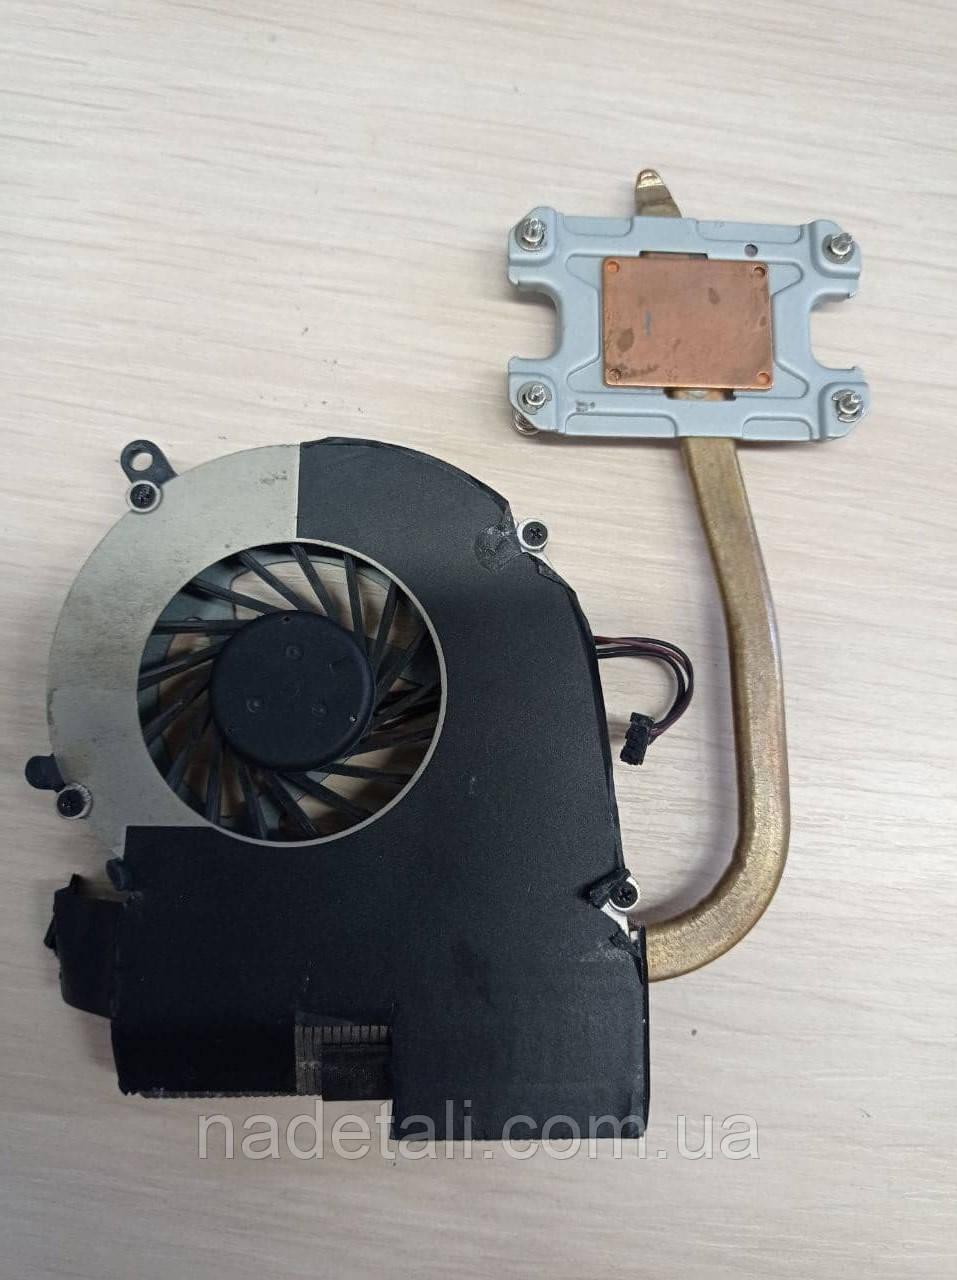 Система охлаждения HP Compaq CQ58 686259-001